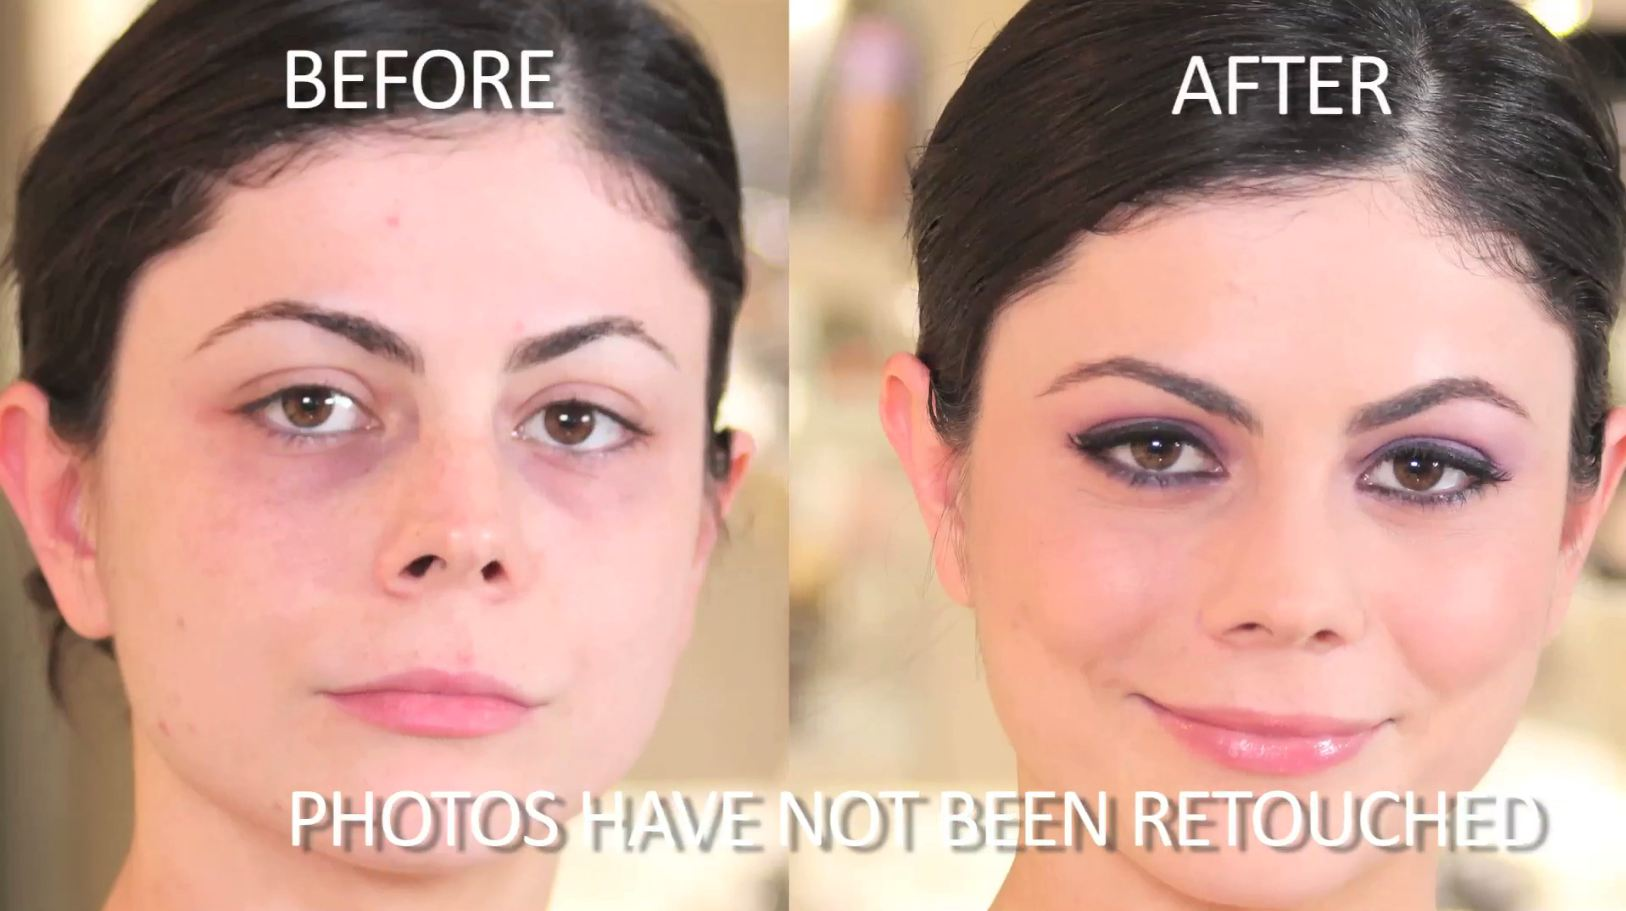 How to beauty tutorial applying false lashes huffpost 2011 07 12 beforeafterg baditri Gallery